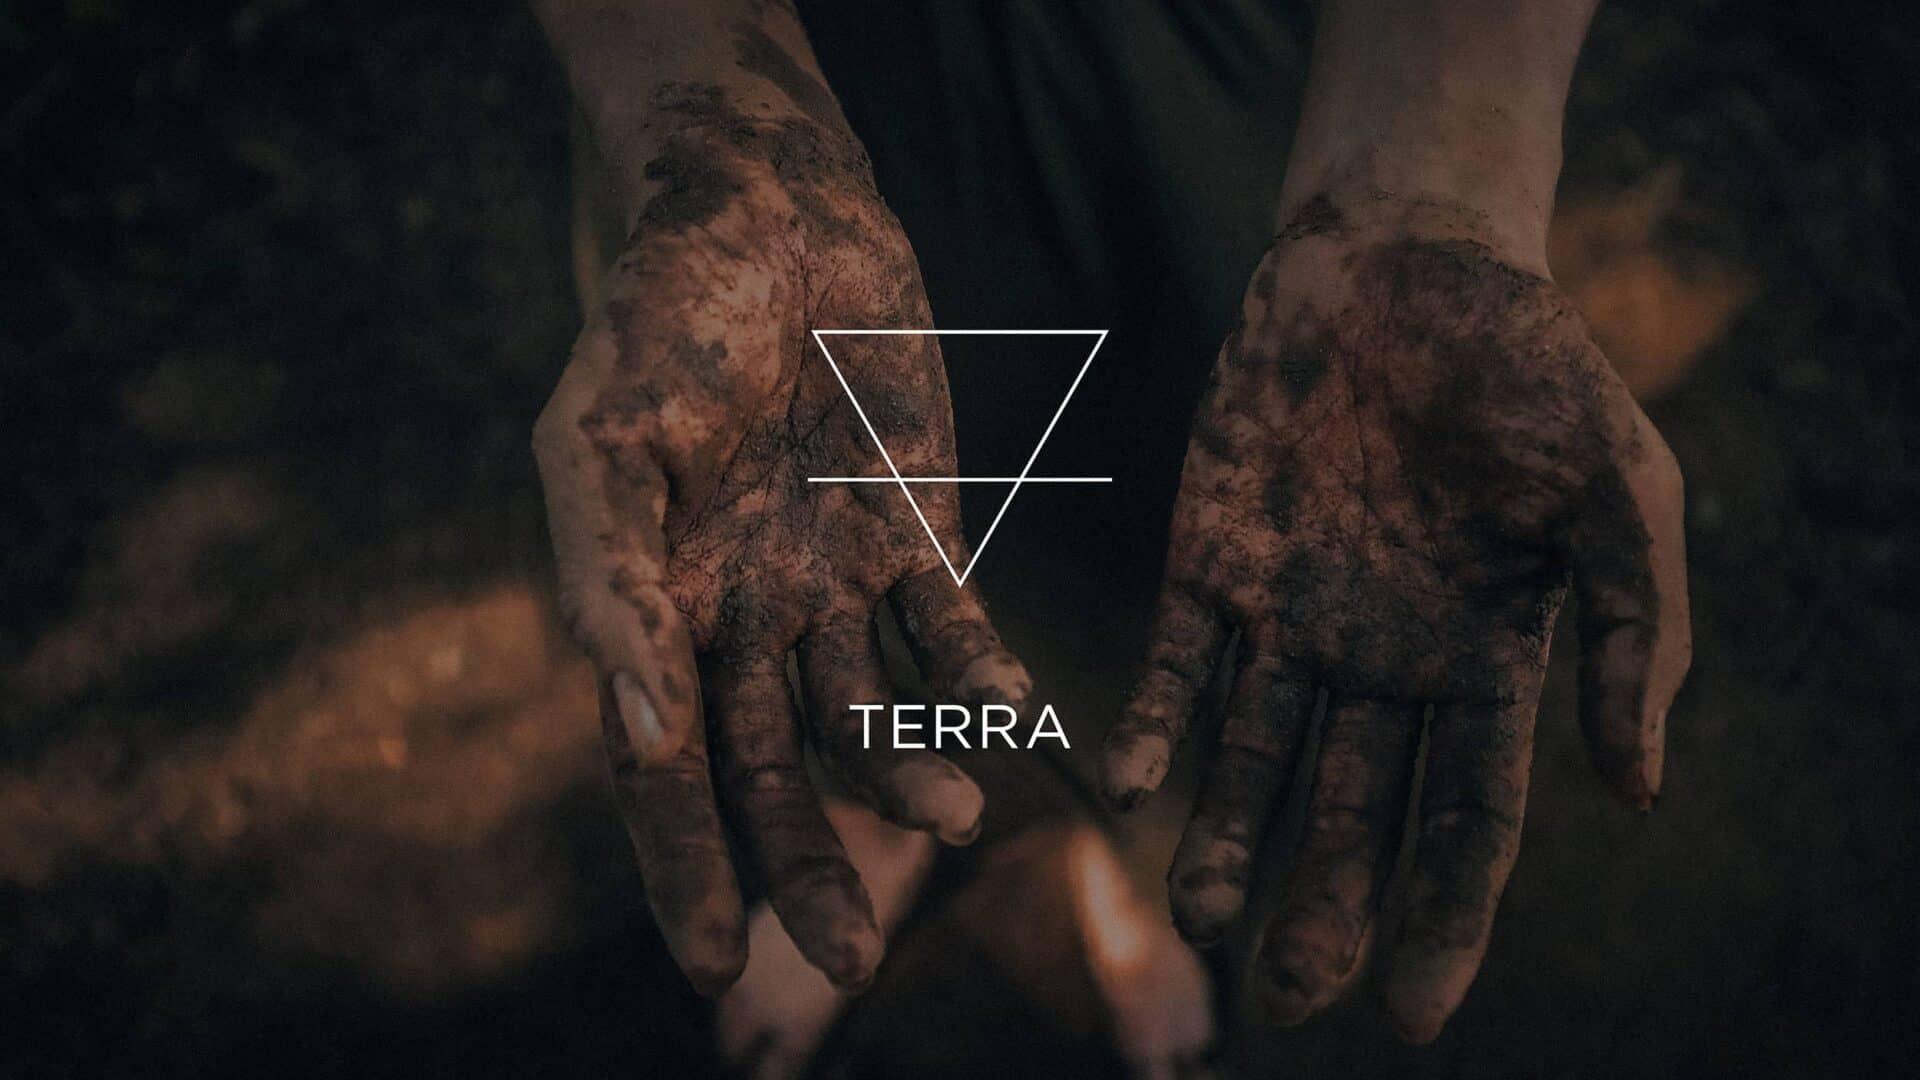 Mãos sujas de terra e o símbolo do elemento Terra